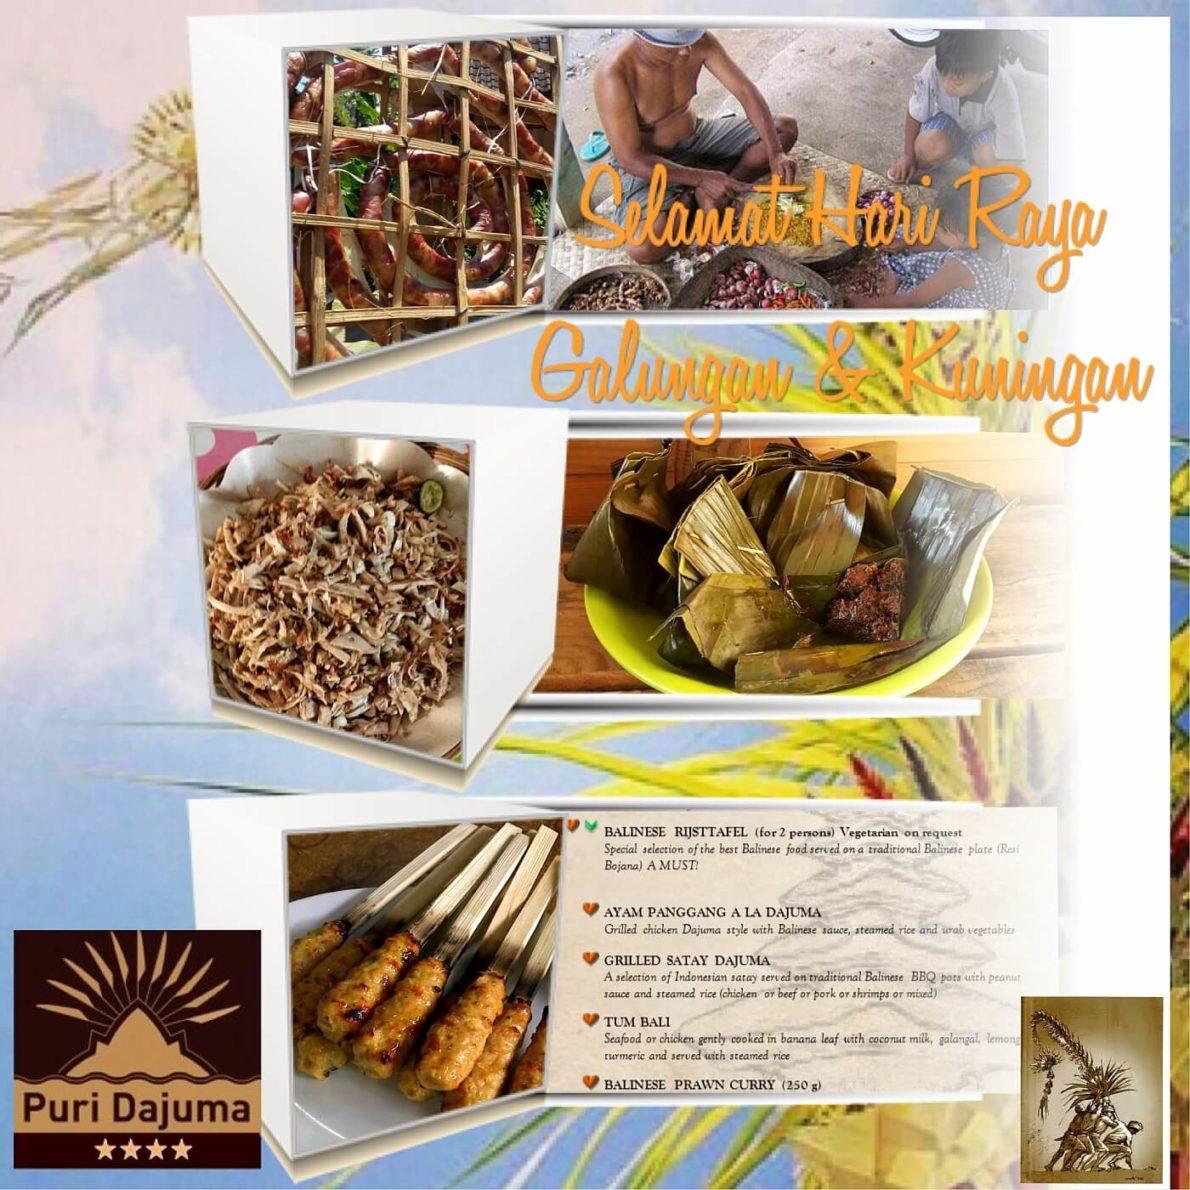 HAPPY GALUNGAN & KUNIGAN! Puri Dajuma, Beach Eco-Resort & Spa, West Bali